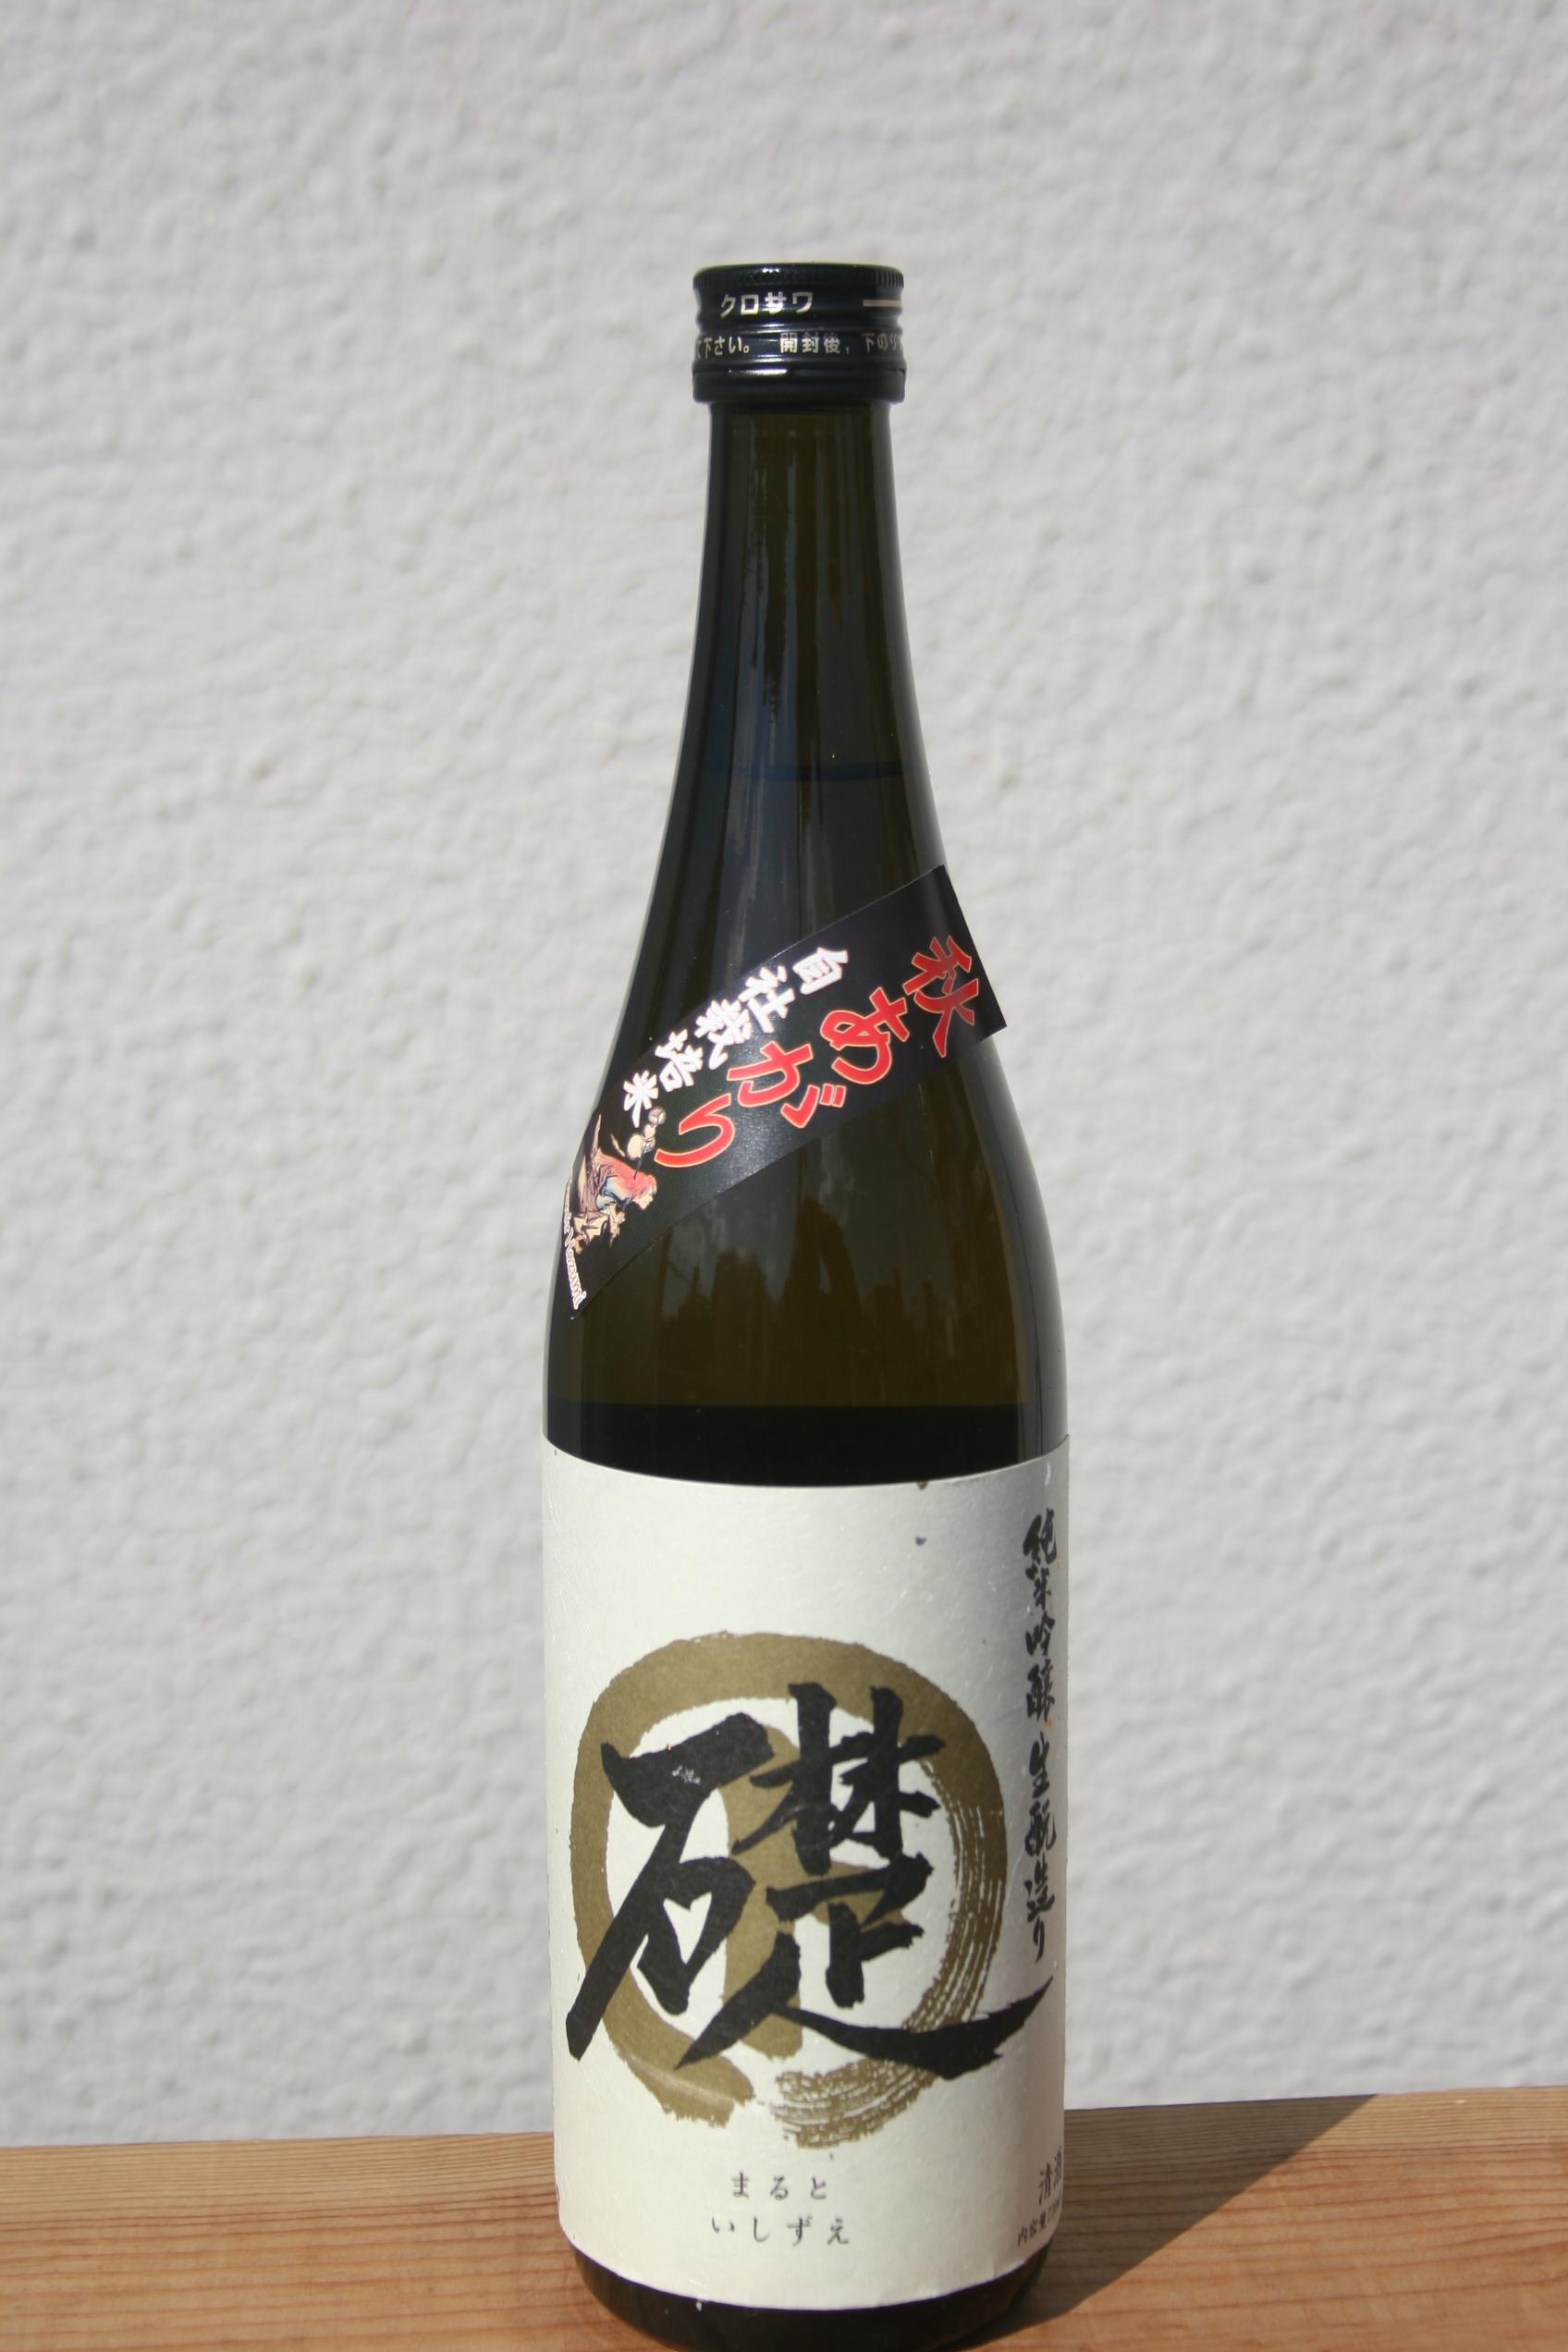 純米吟醸生酛造り マルト礎 無濾過原酒